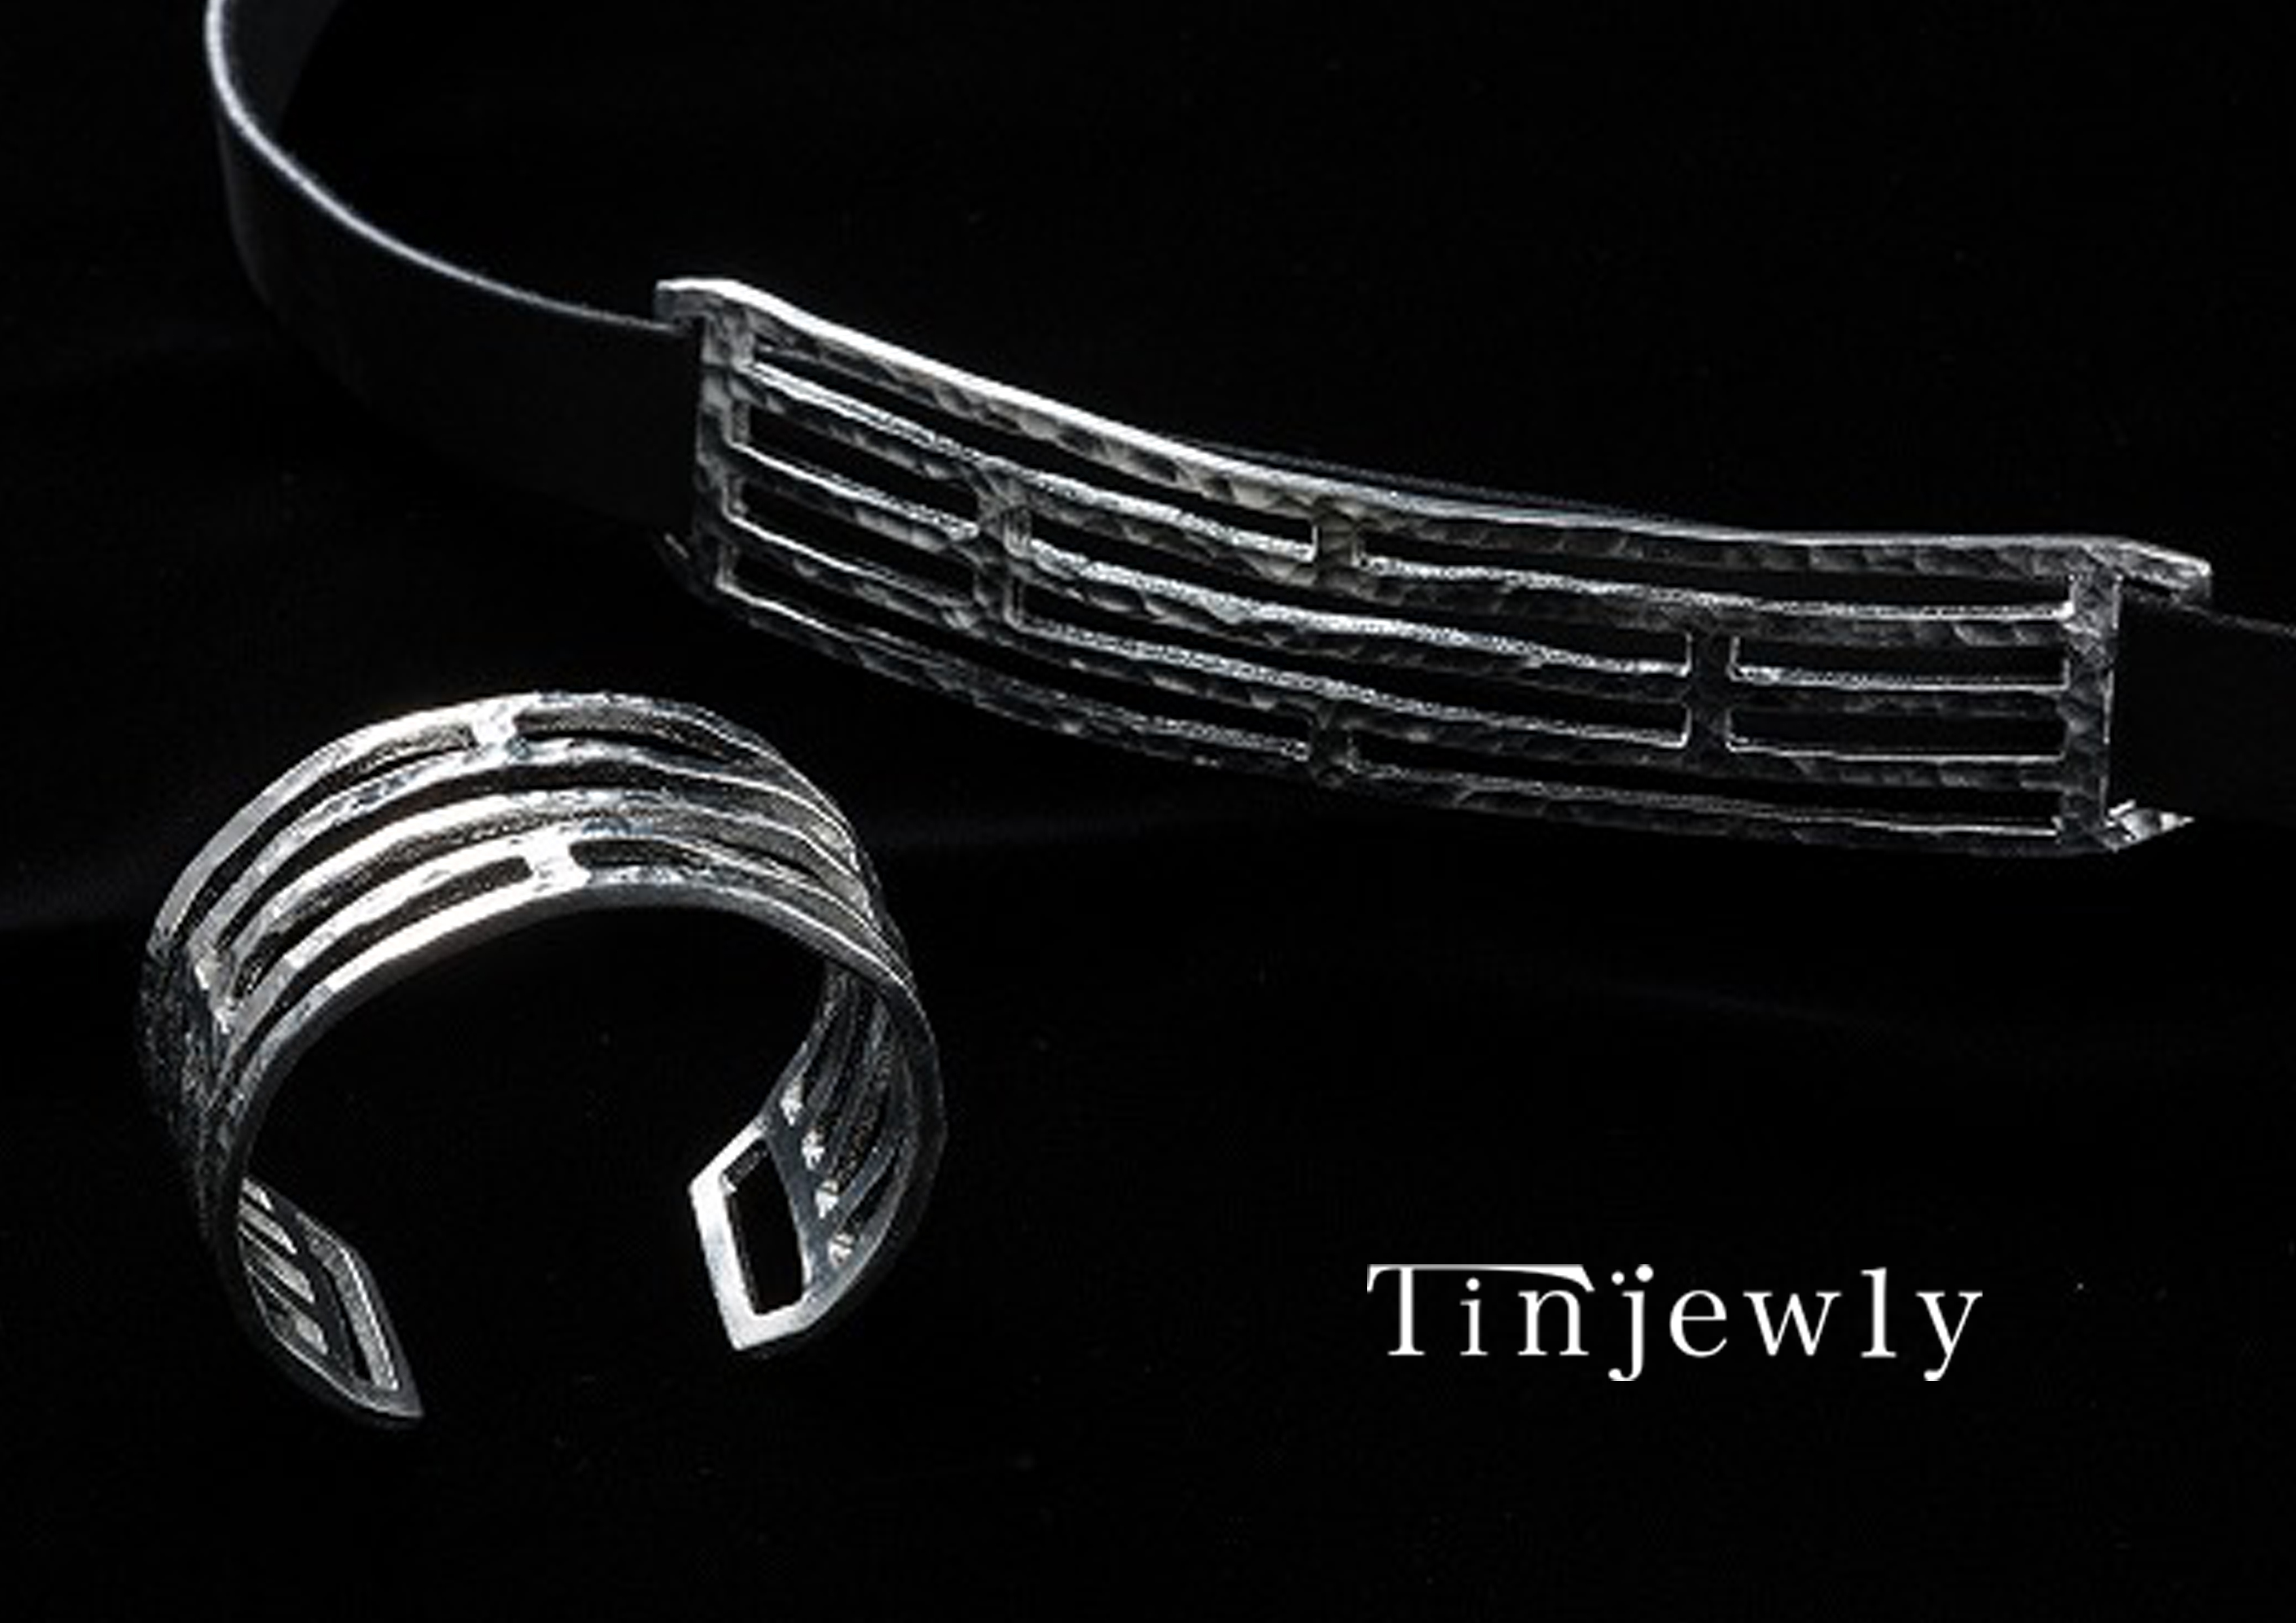 Tinjewly(ティンジェリー)